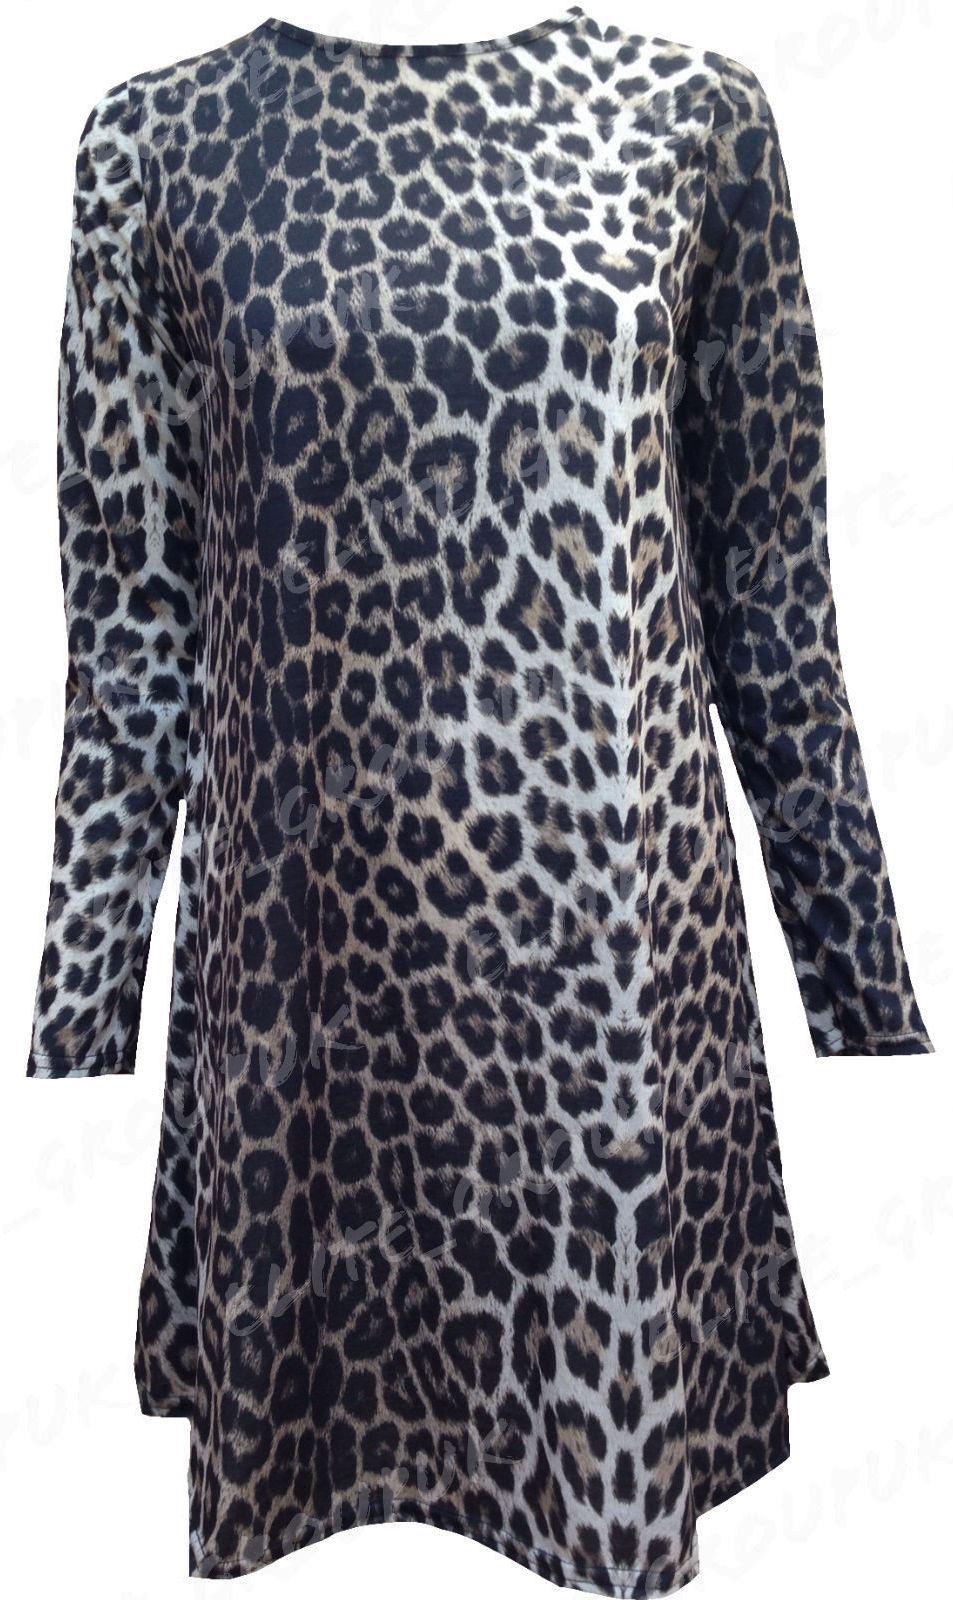 Leopard clothes for women